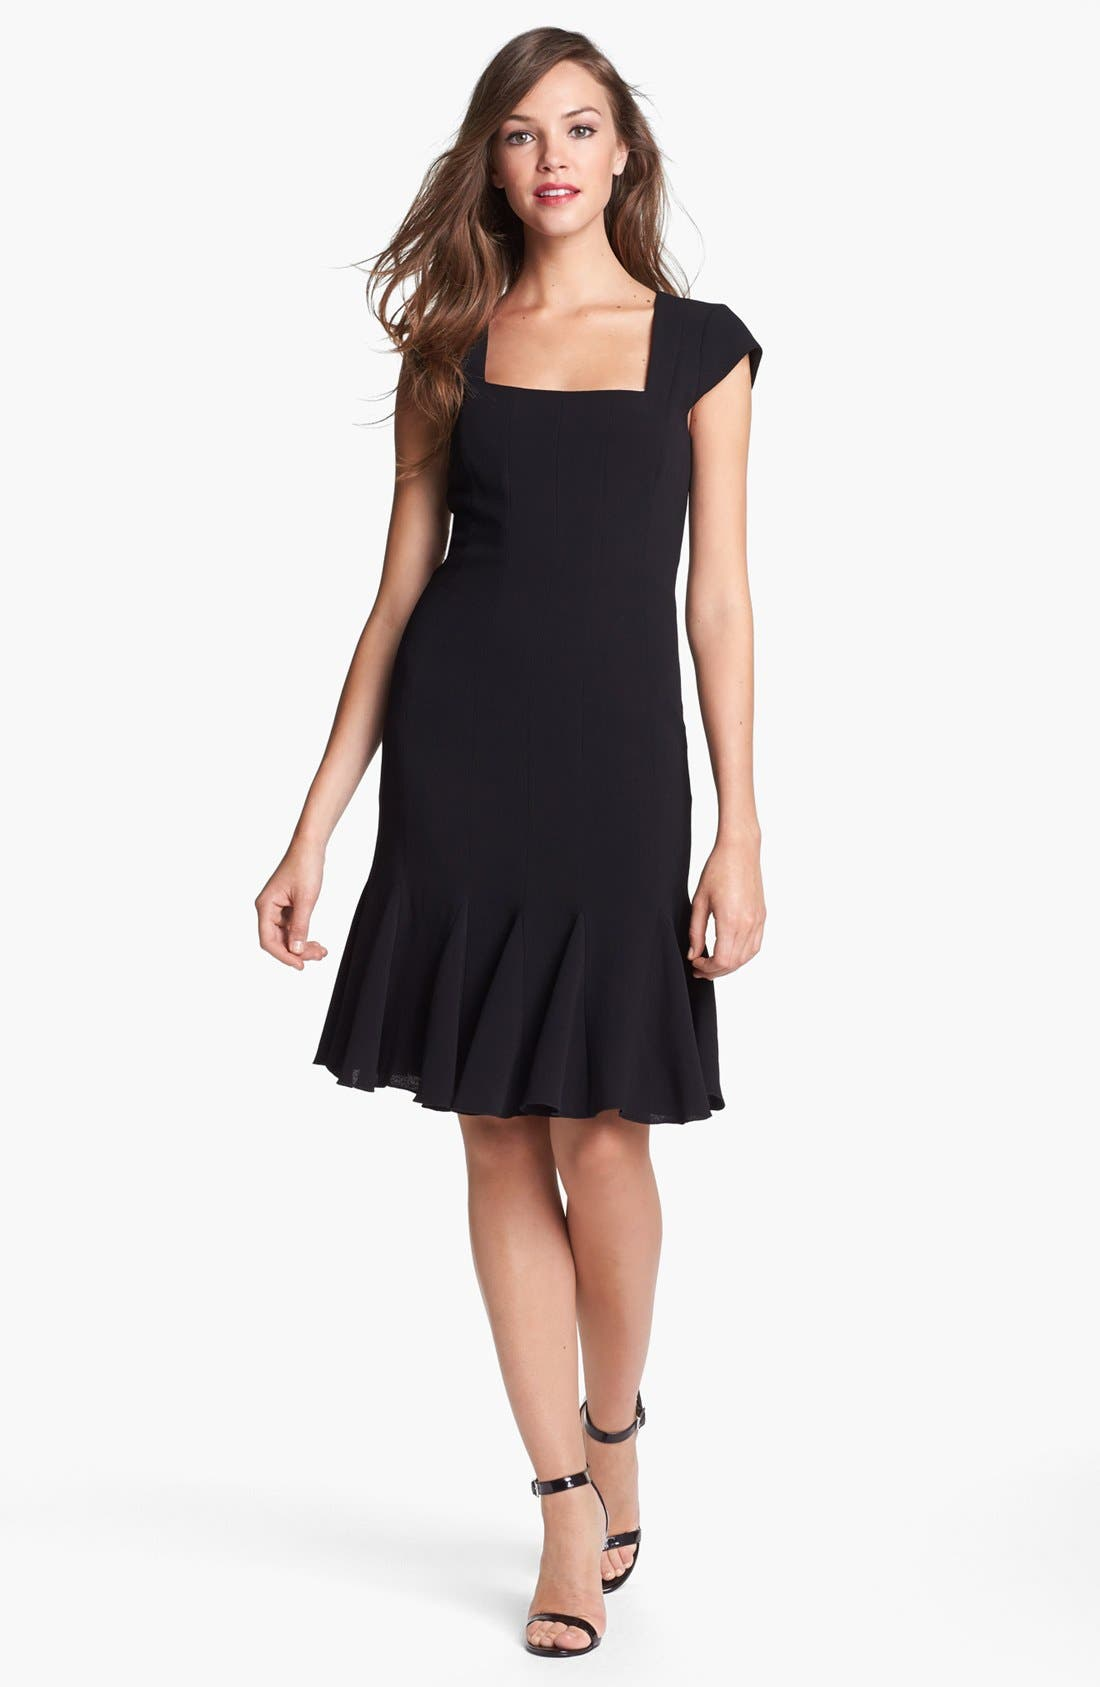 Main Image - BCBGMAXAZRIA Cap Sleeve Fit & Flare Dress